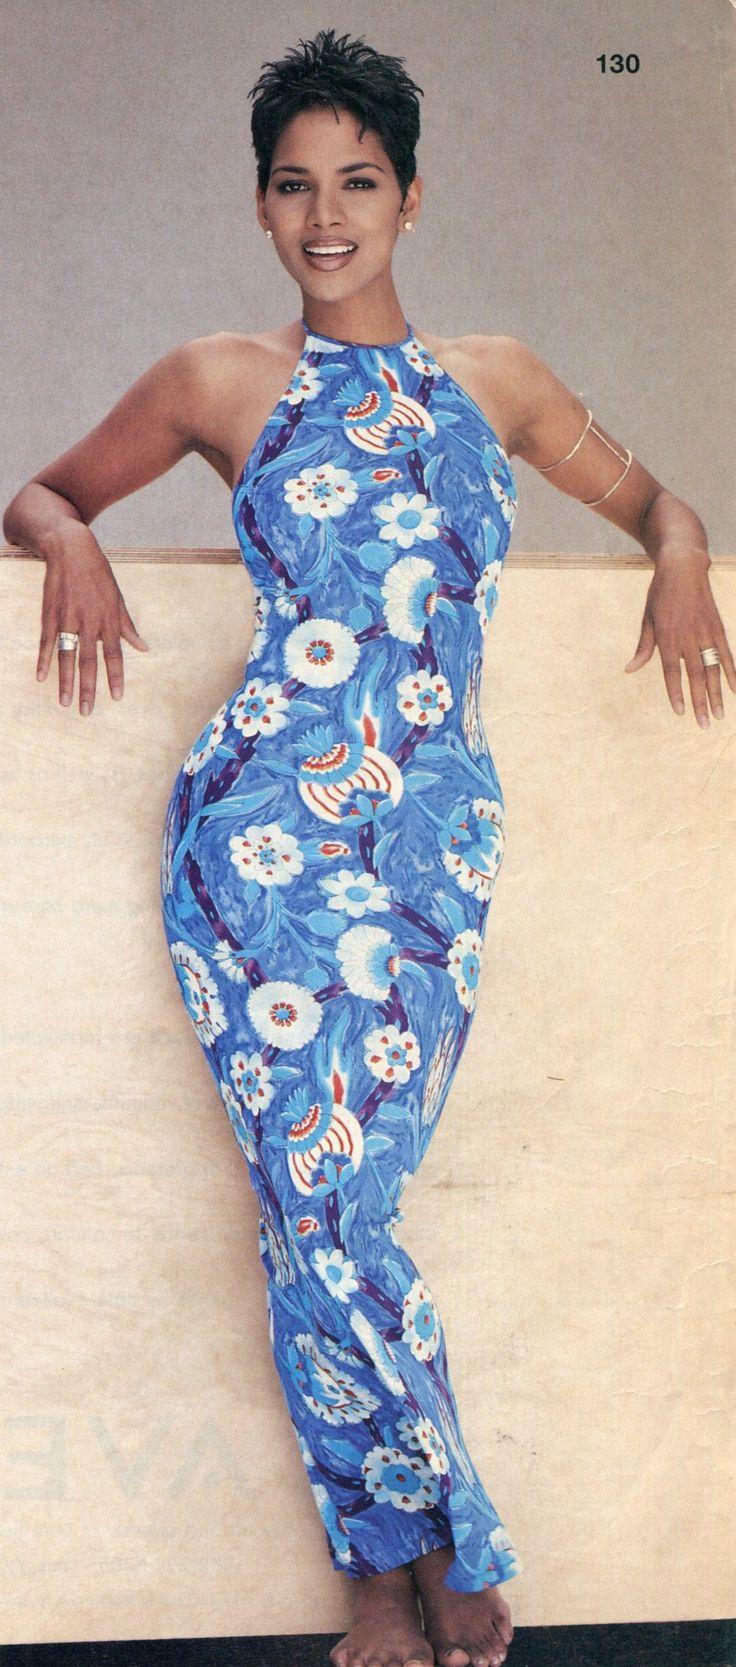 Pixie cut - Halle Berry